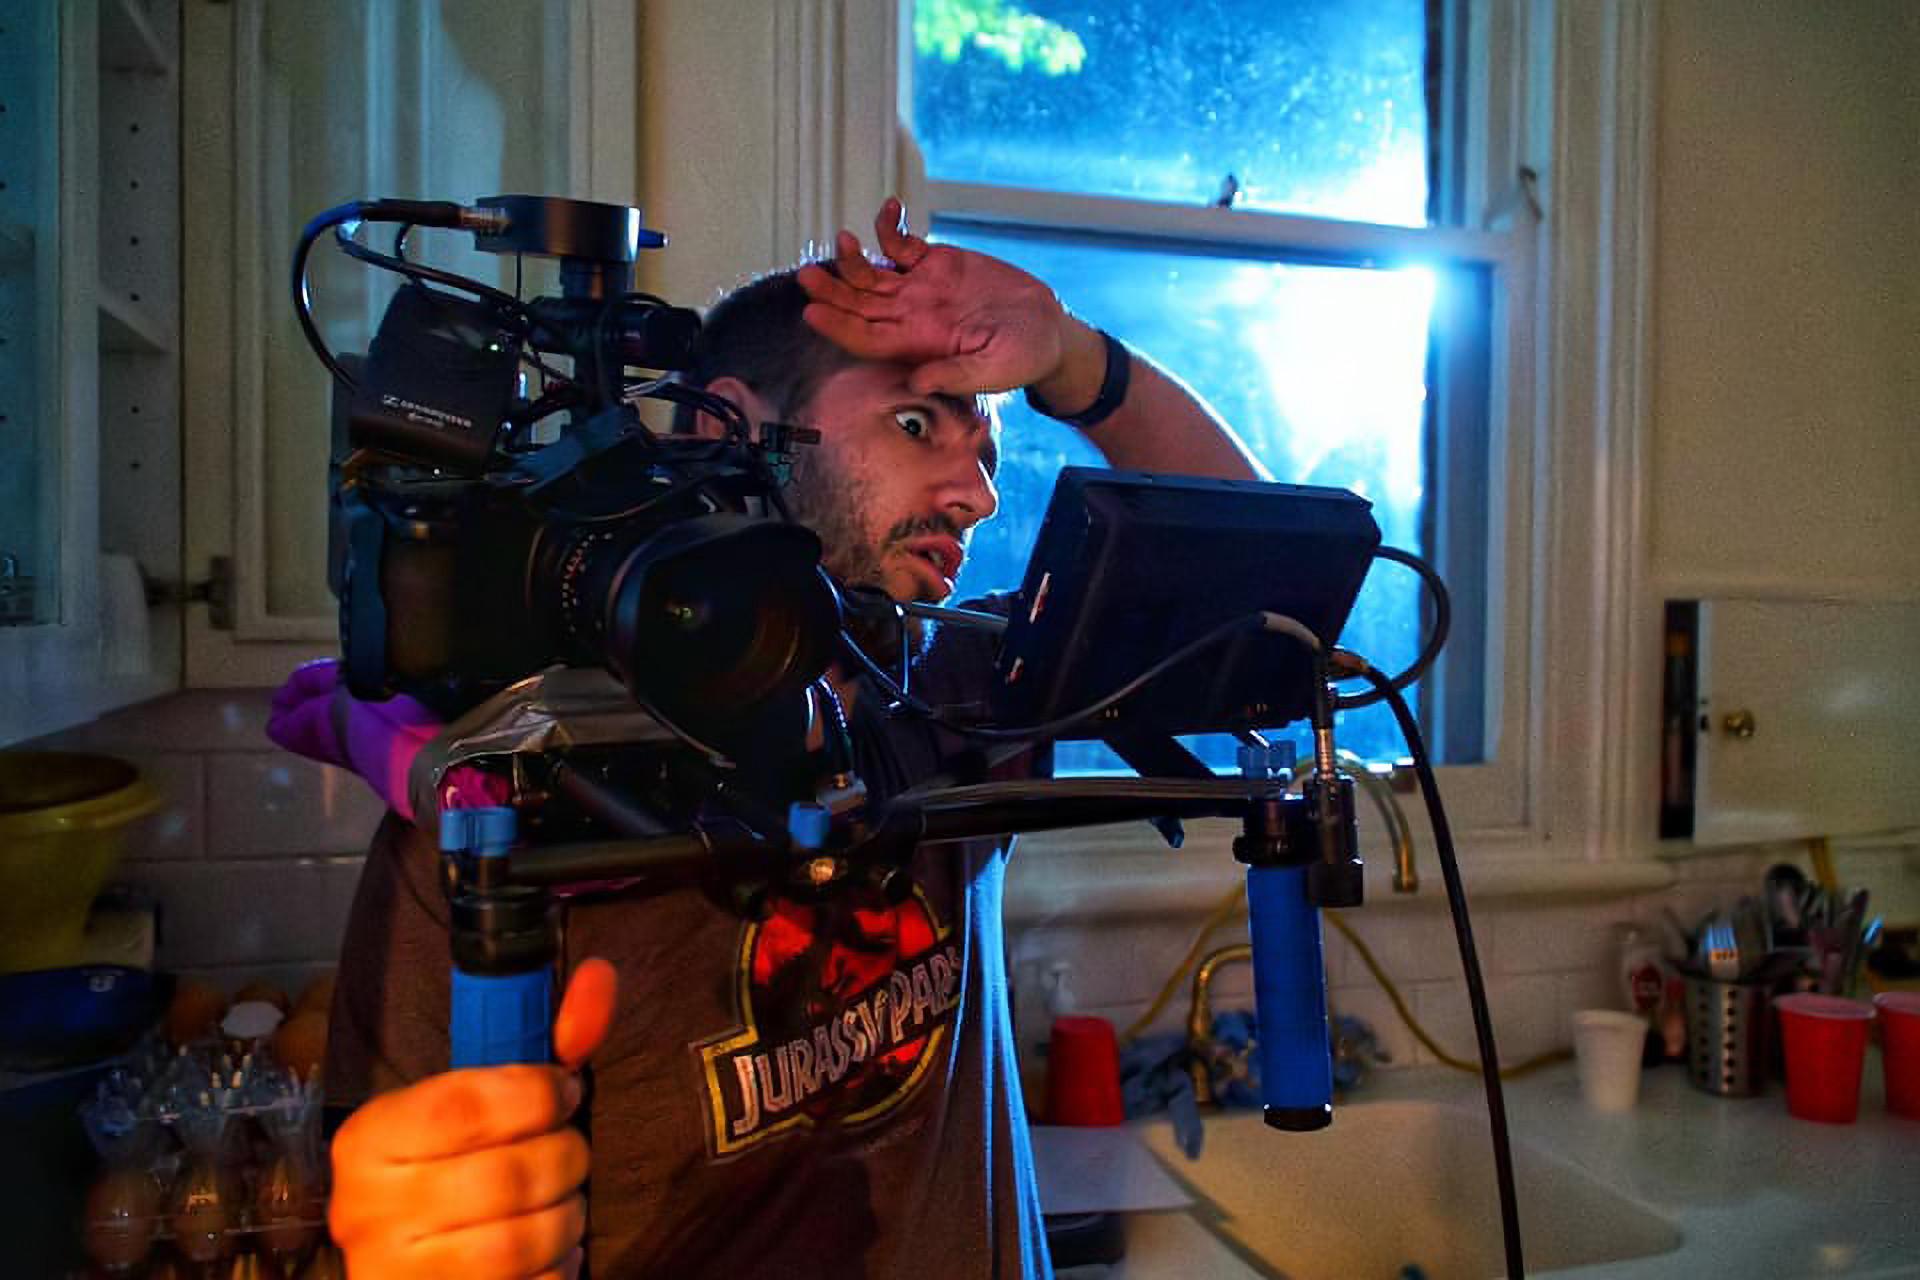 Half Day Camera Operator + Equipment.